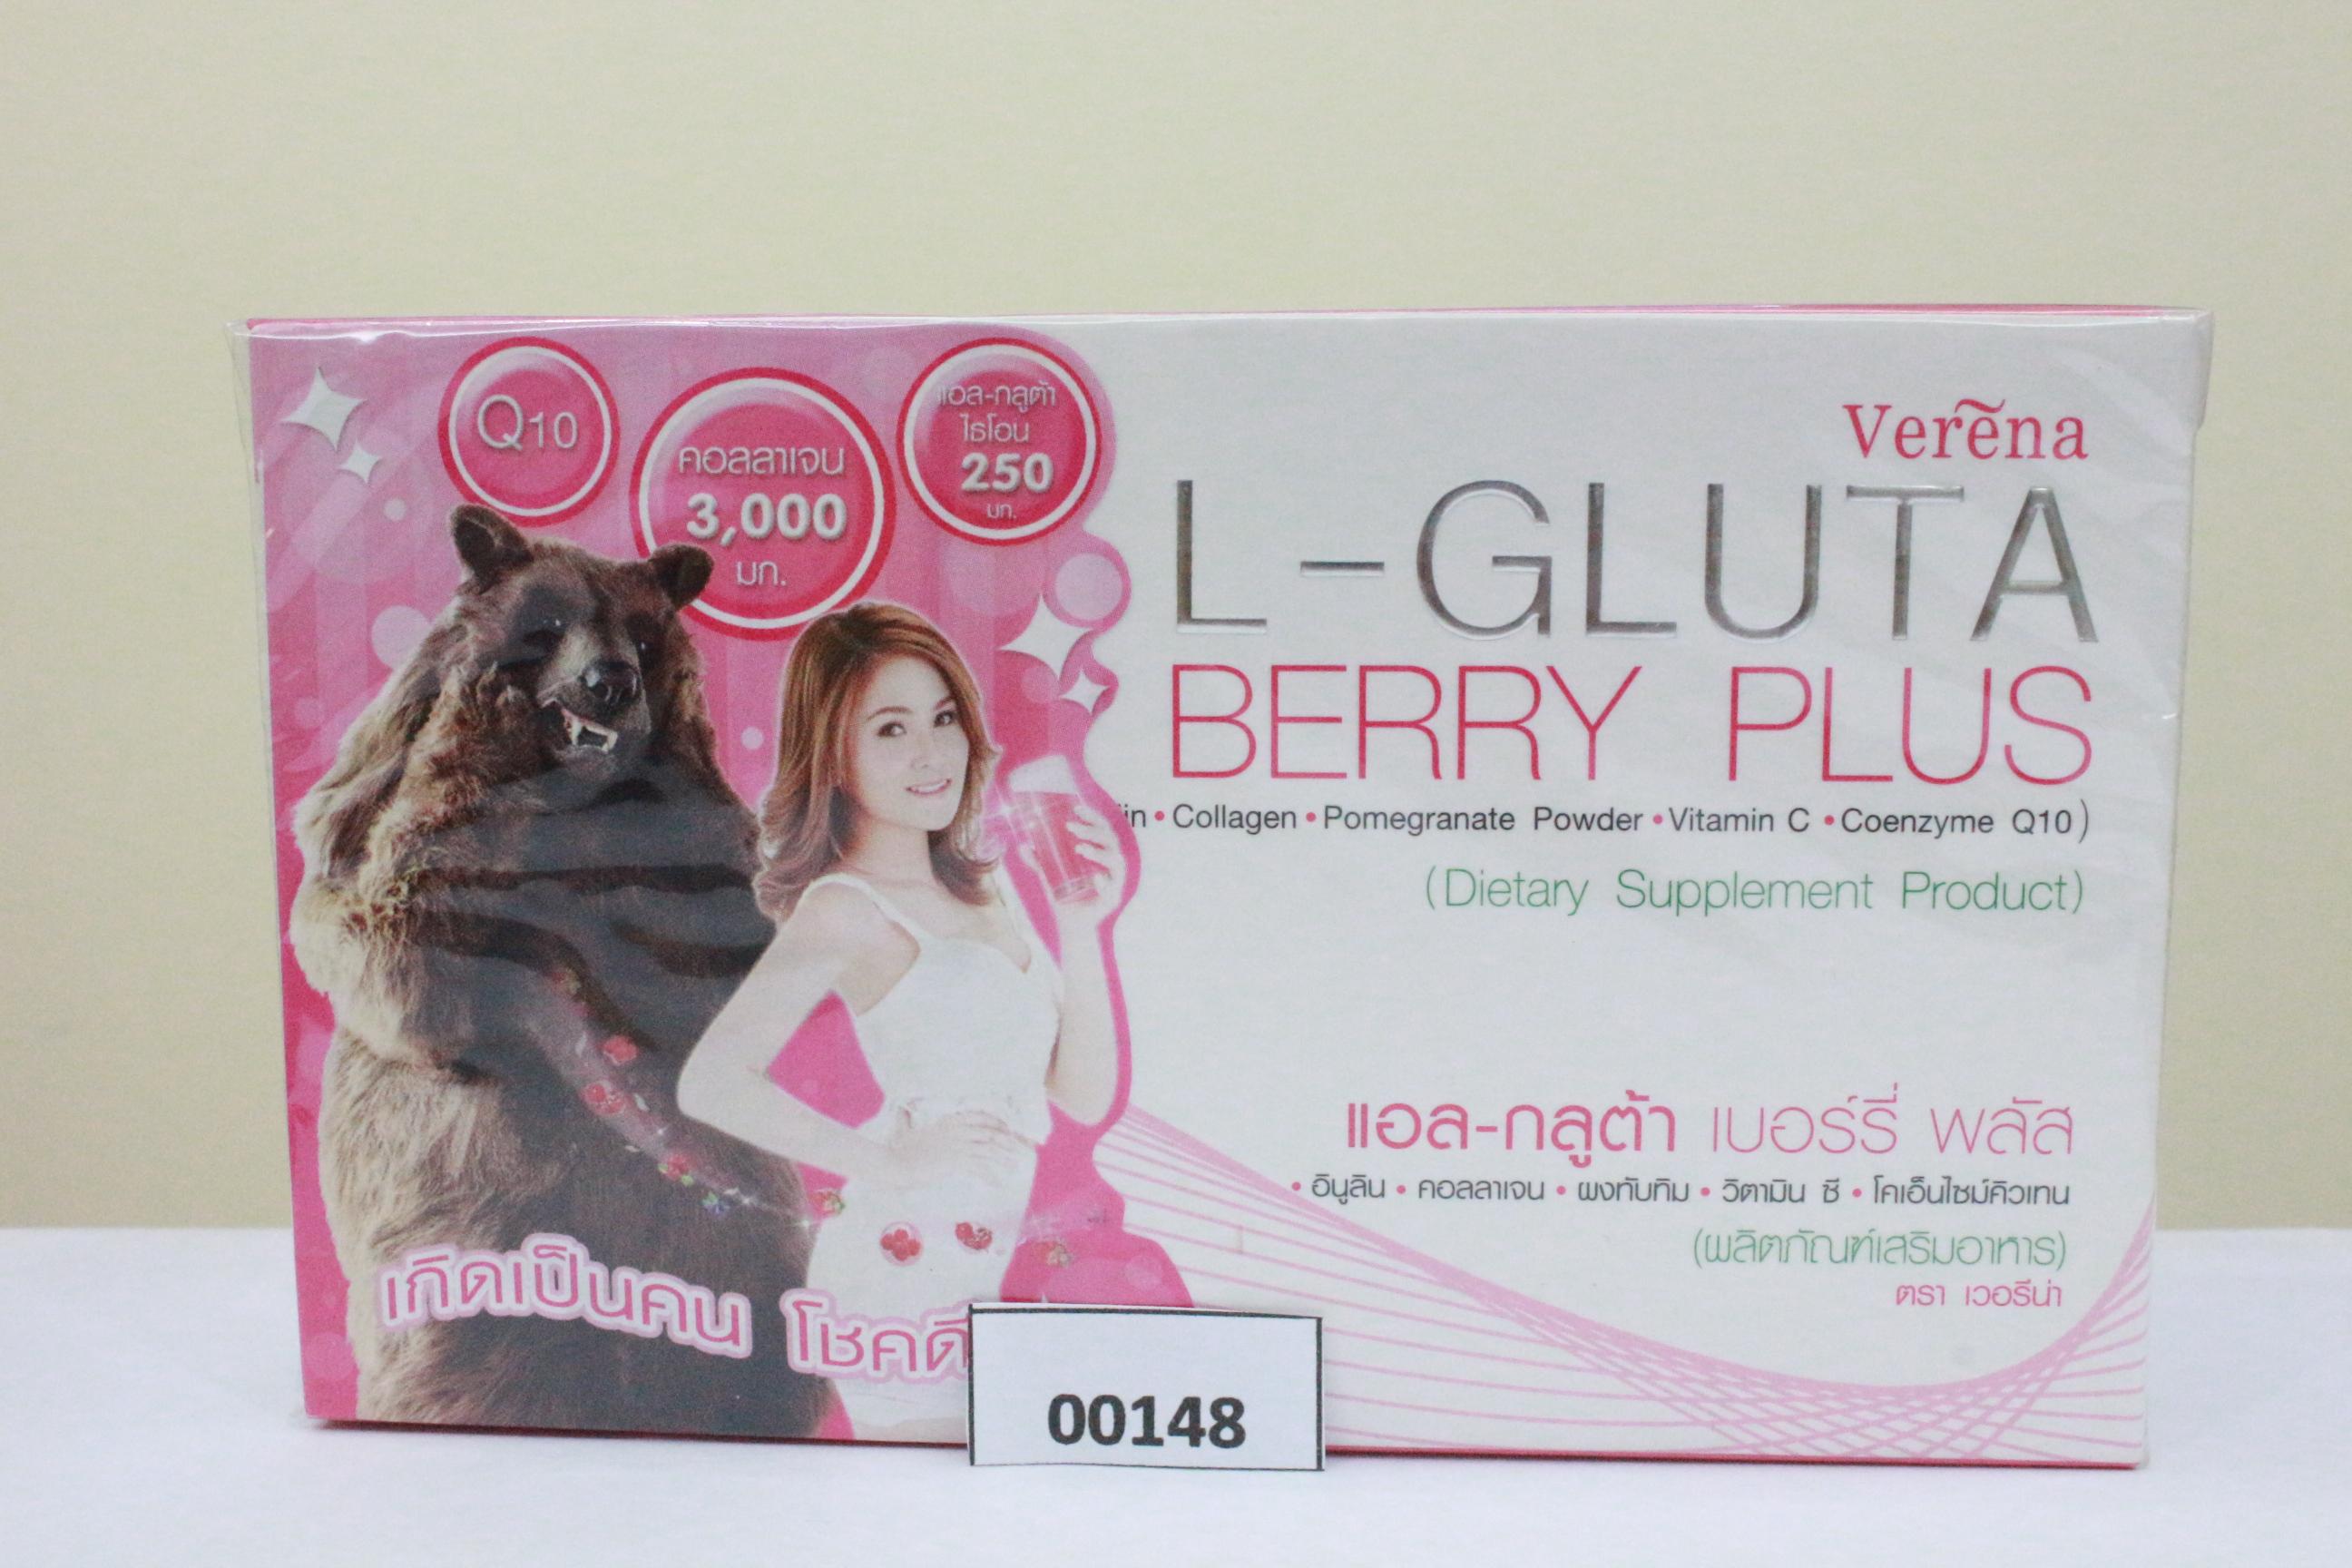 verana L-Gluta berry plus ผิวใส หน้าเด็ก ชงดื่มง่าย